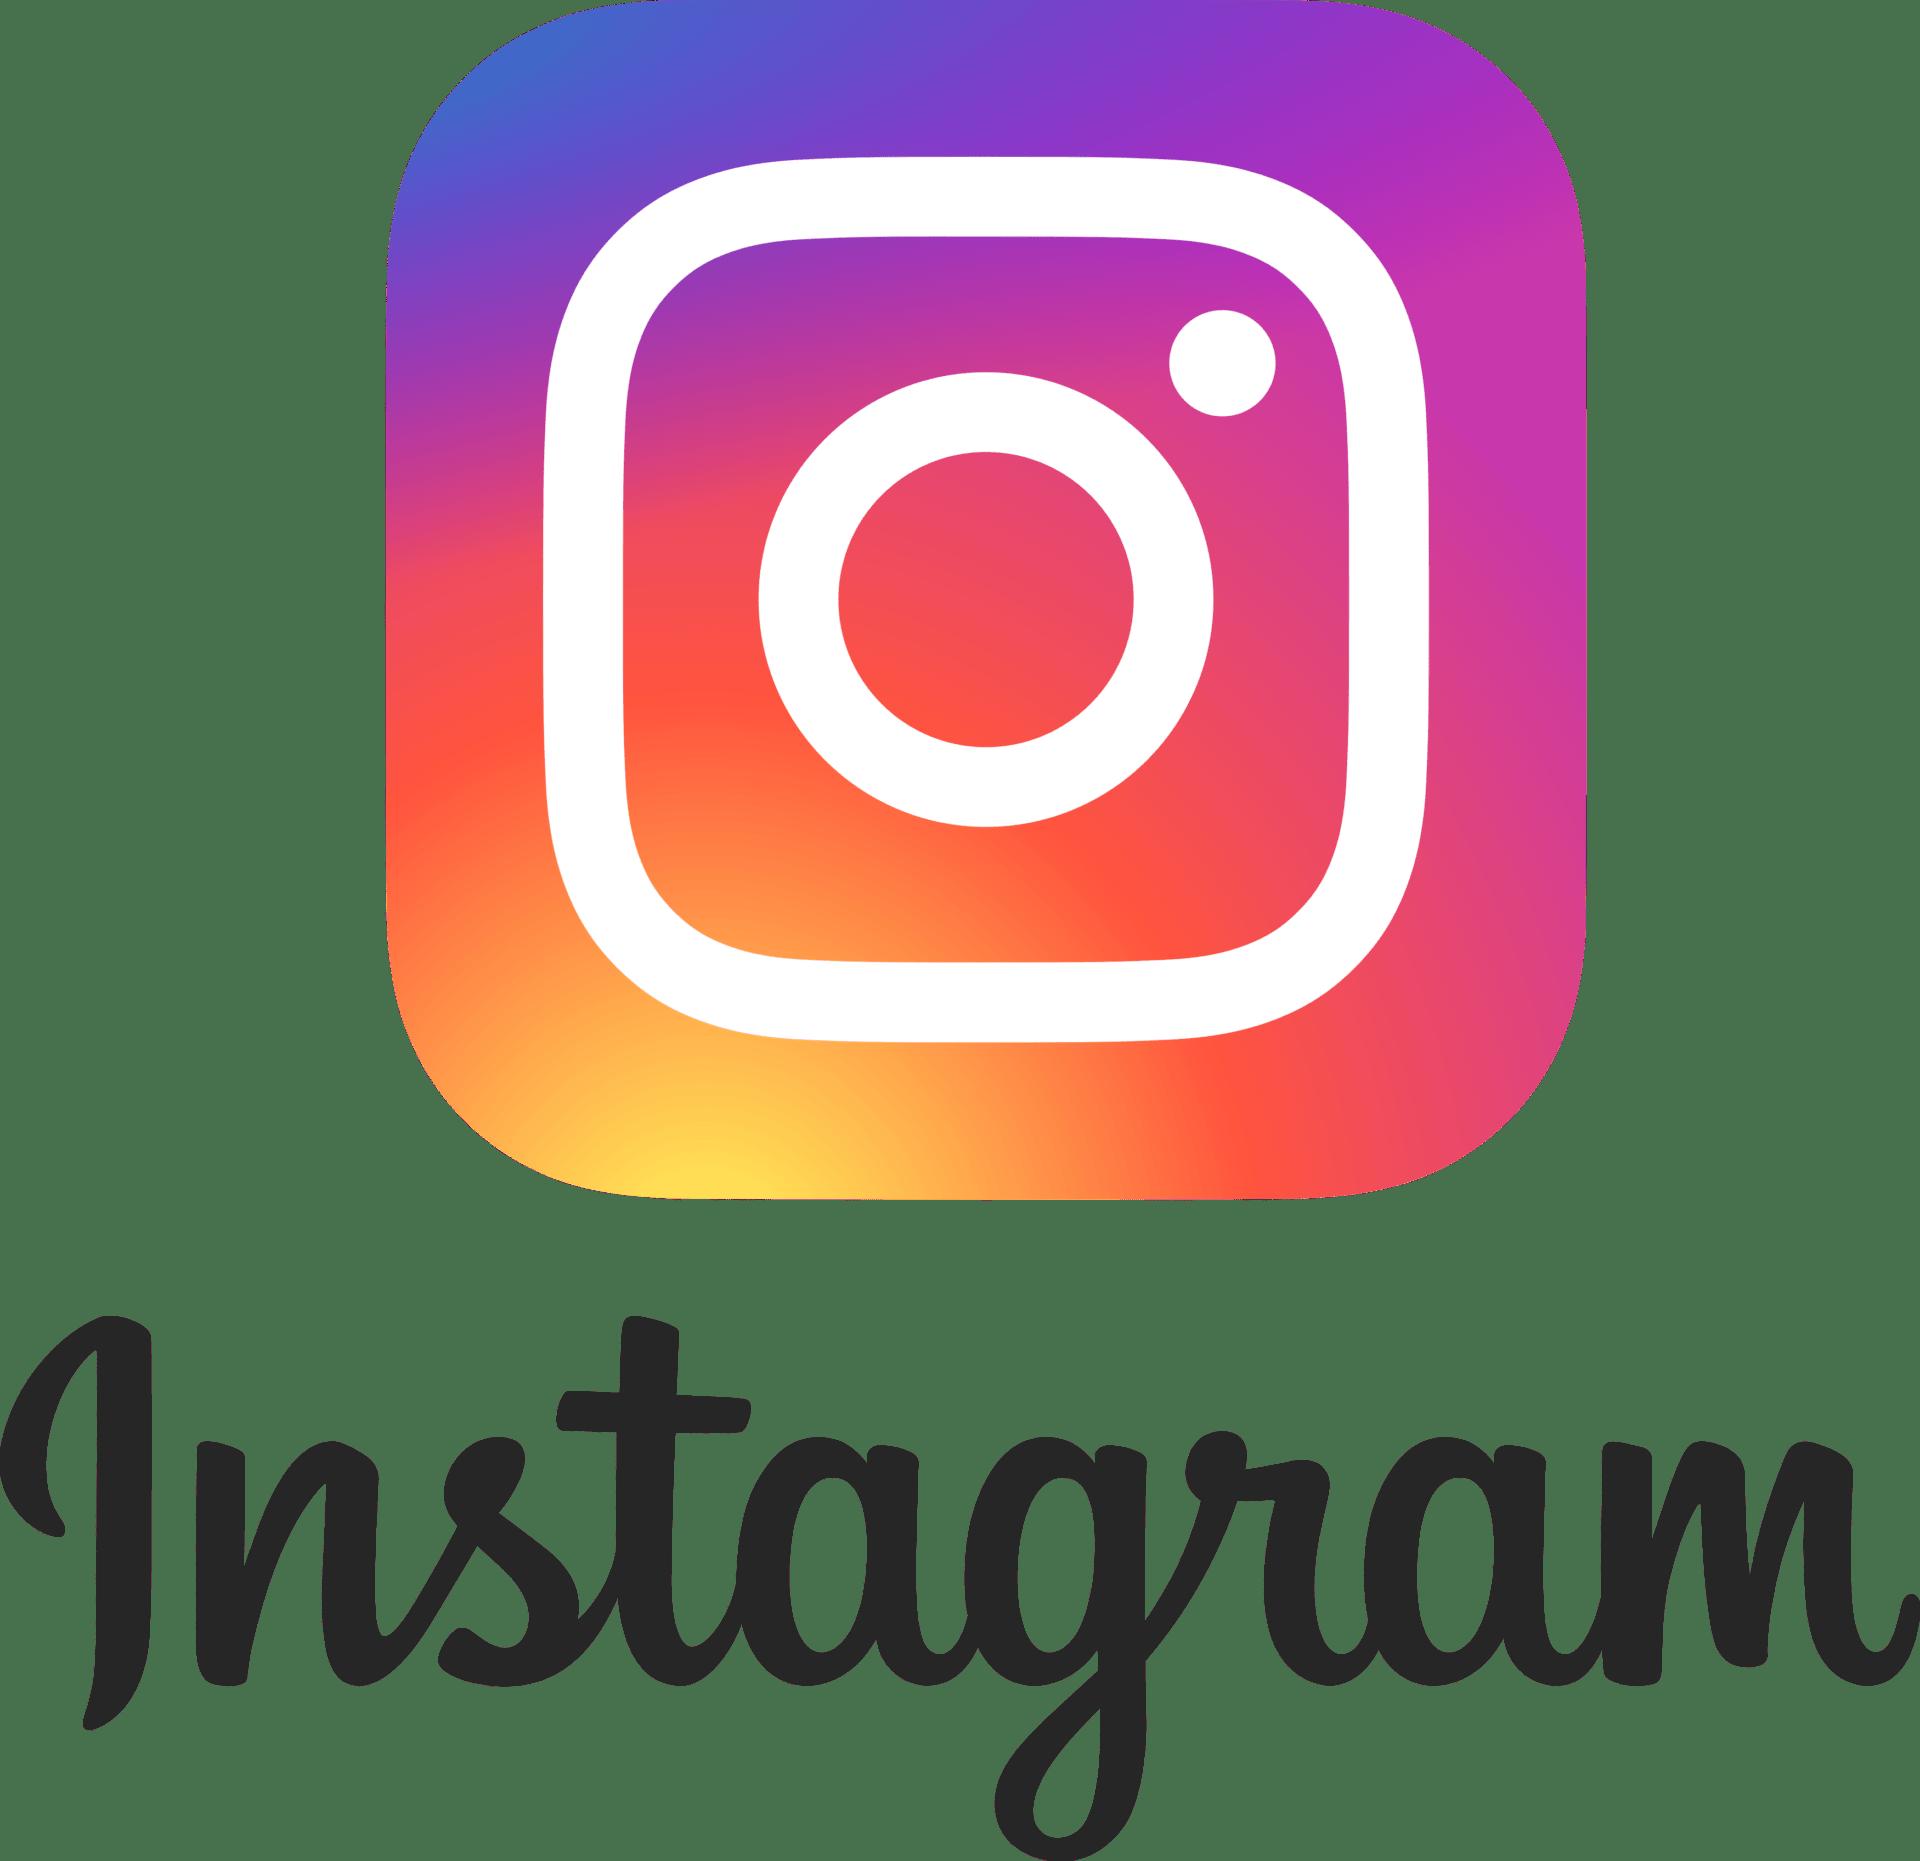 Paano makita ang mga post na nagustuhan ko sa Instagram